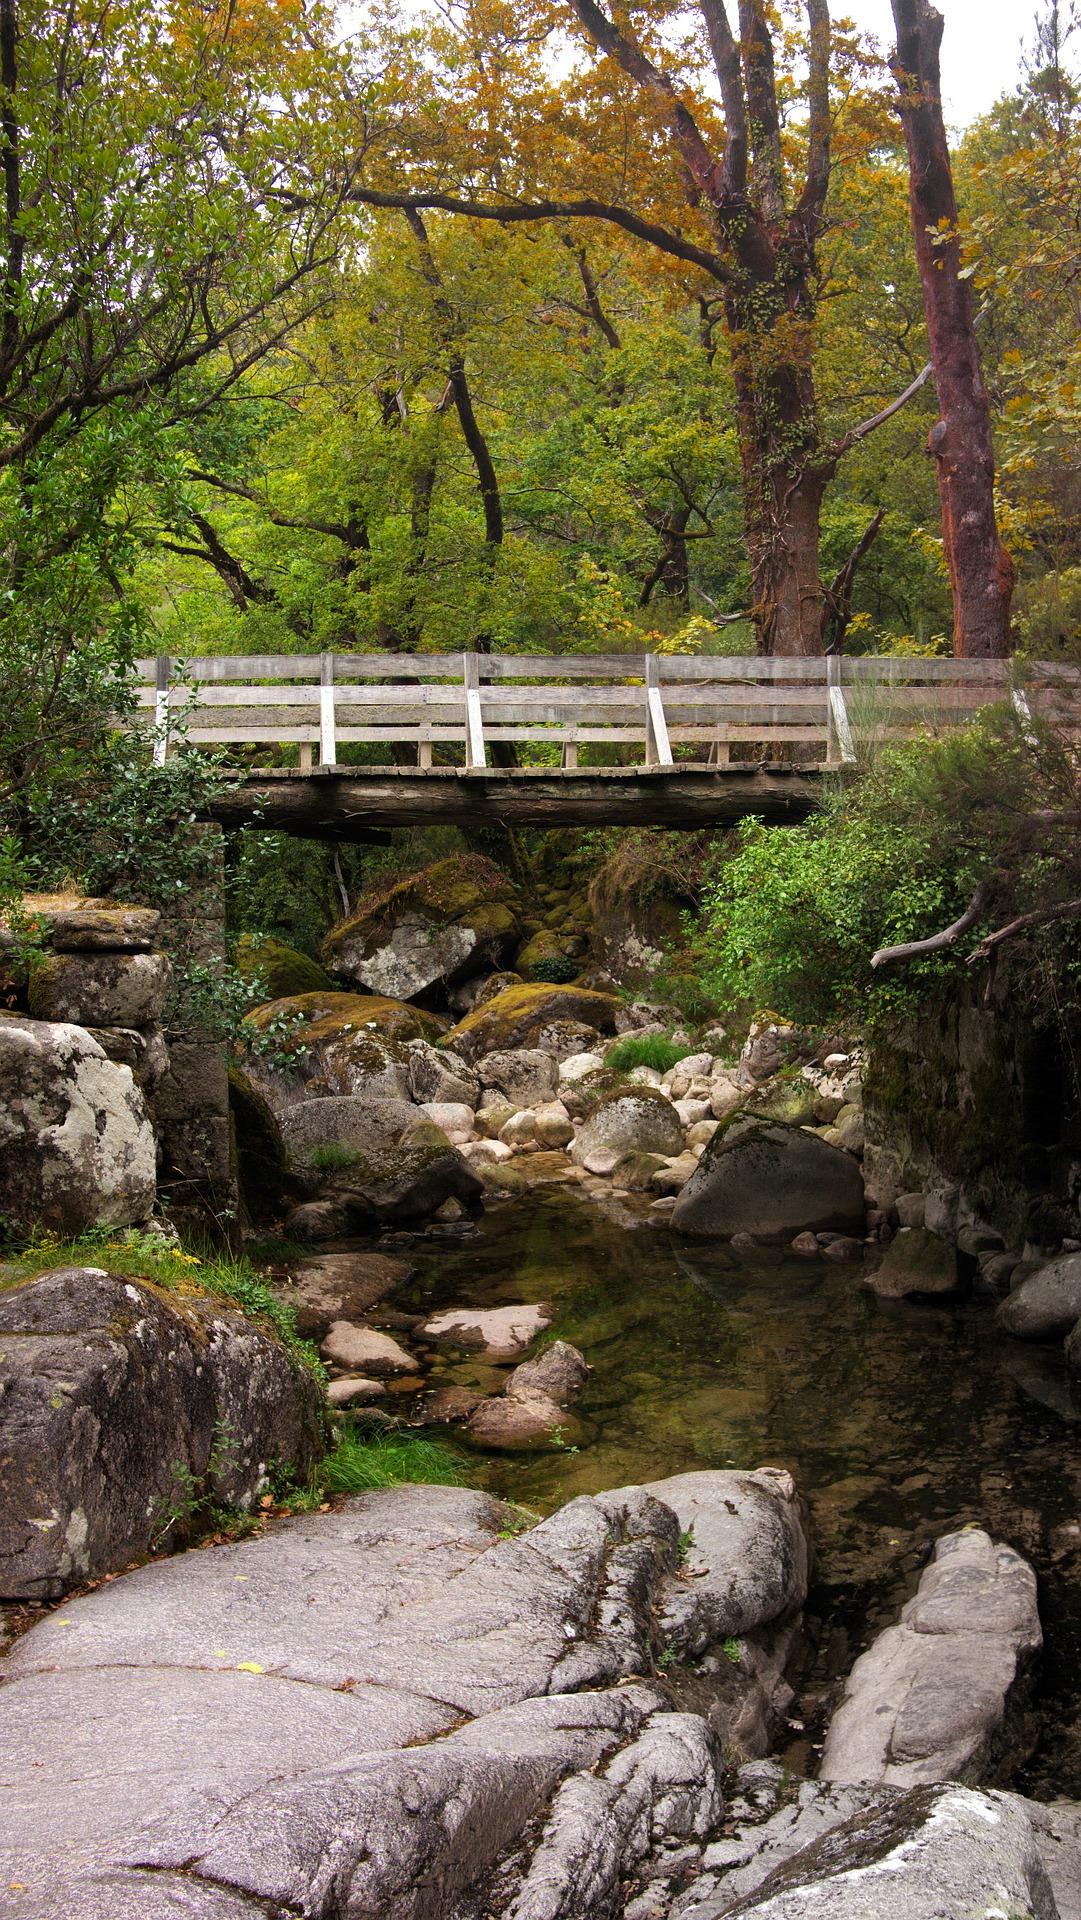 https://pixabay.com/es/puente-naturaleza-paisaje-portugal-1982461/